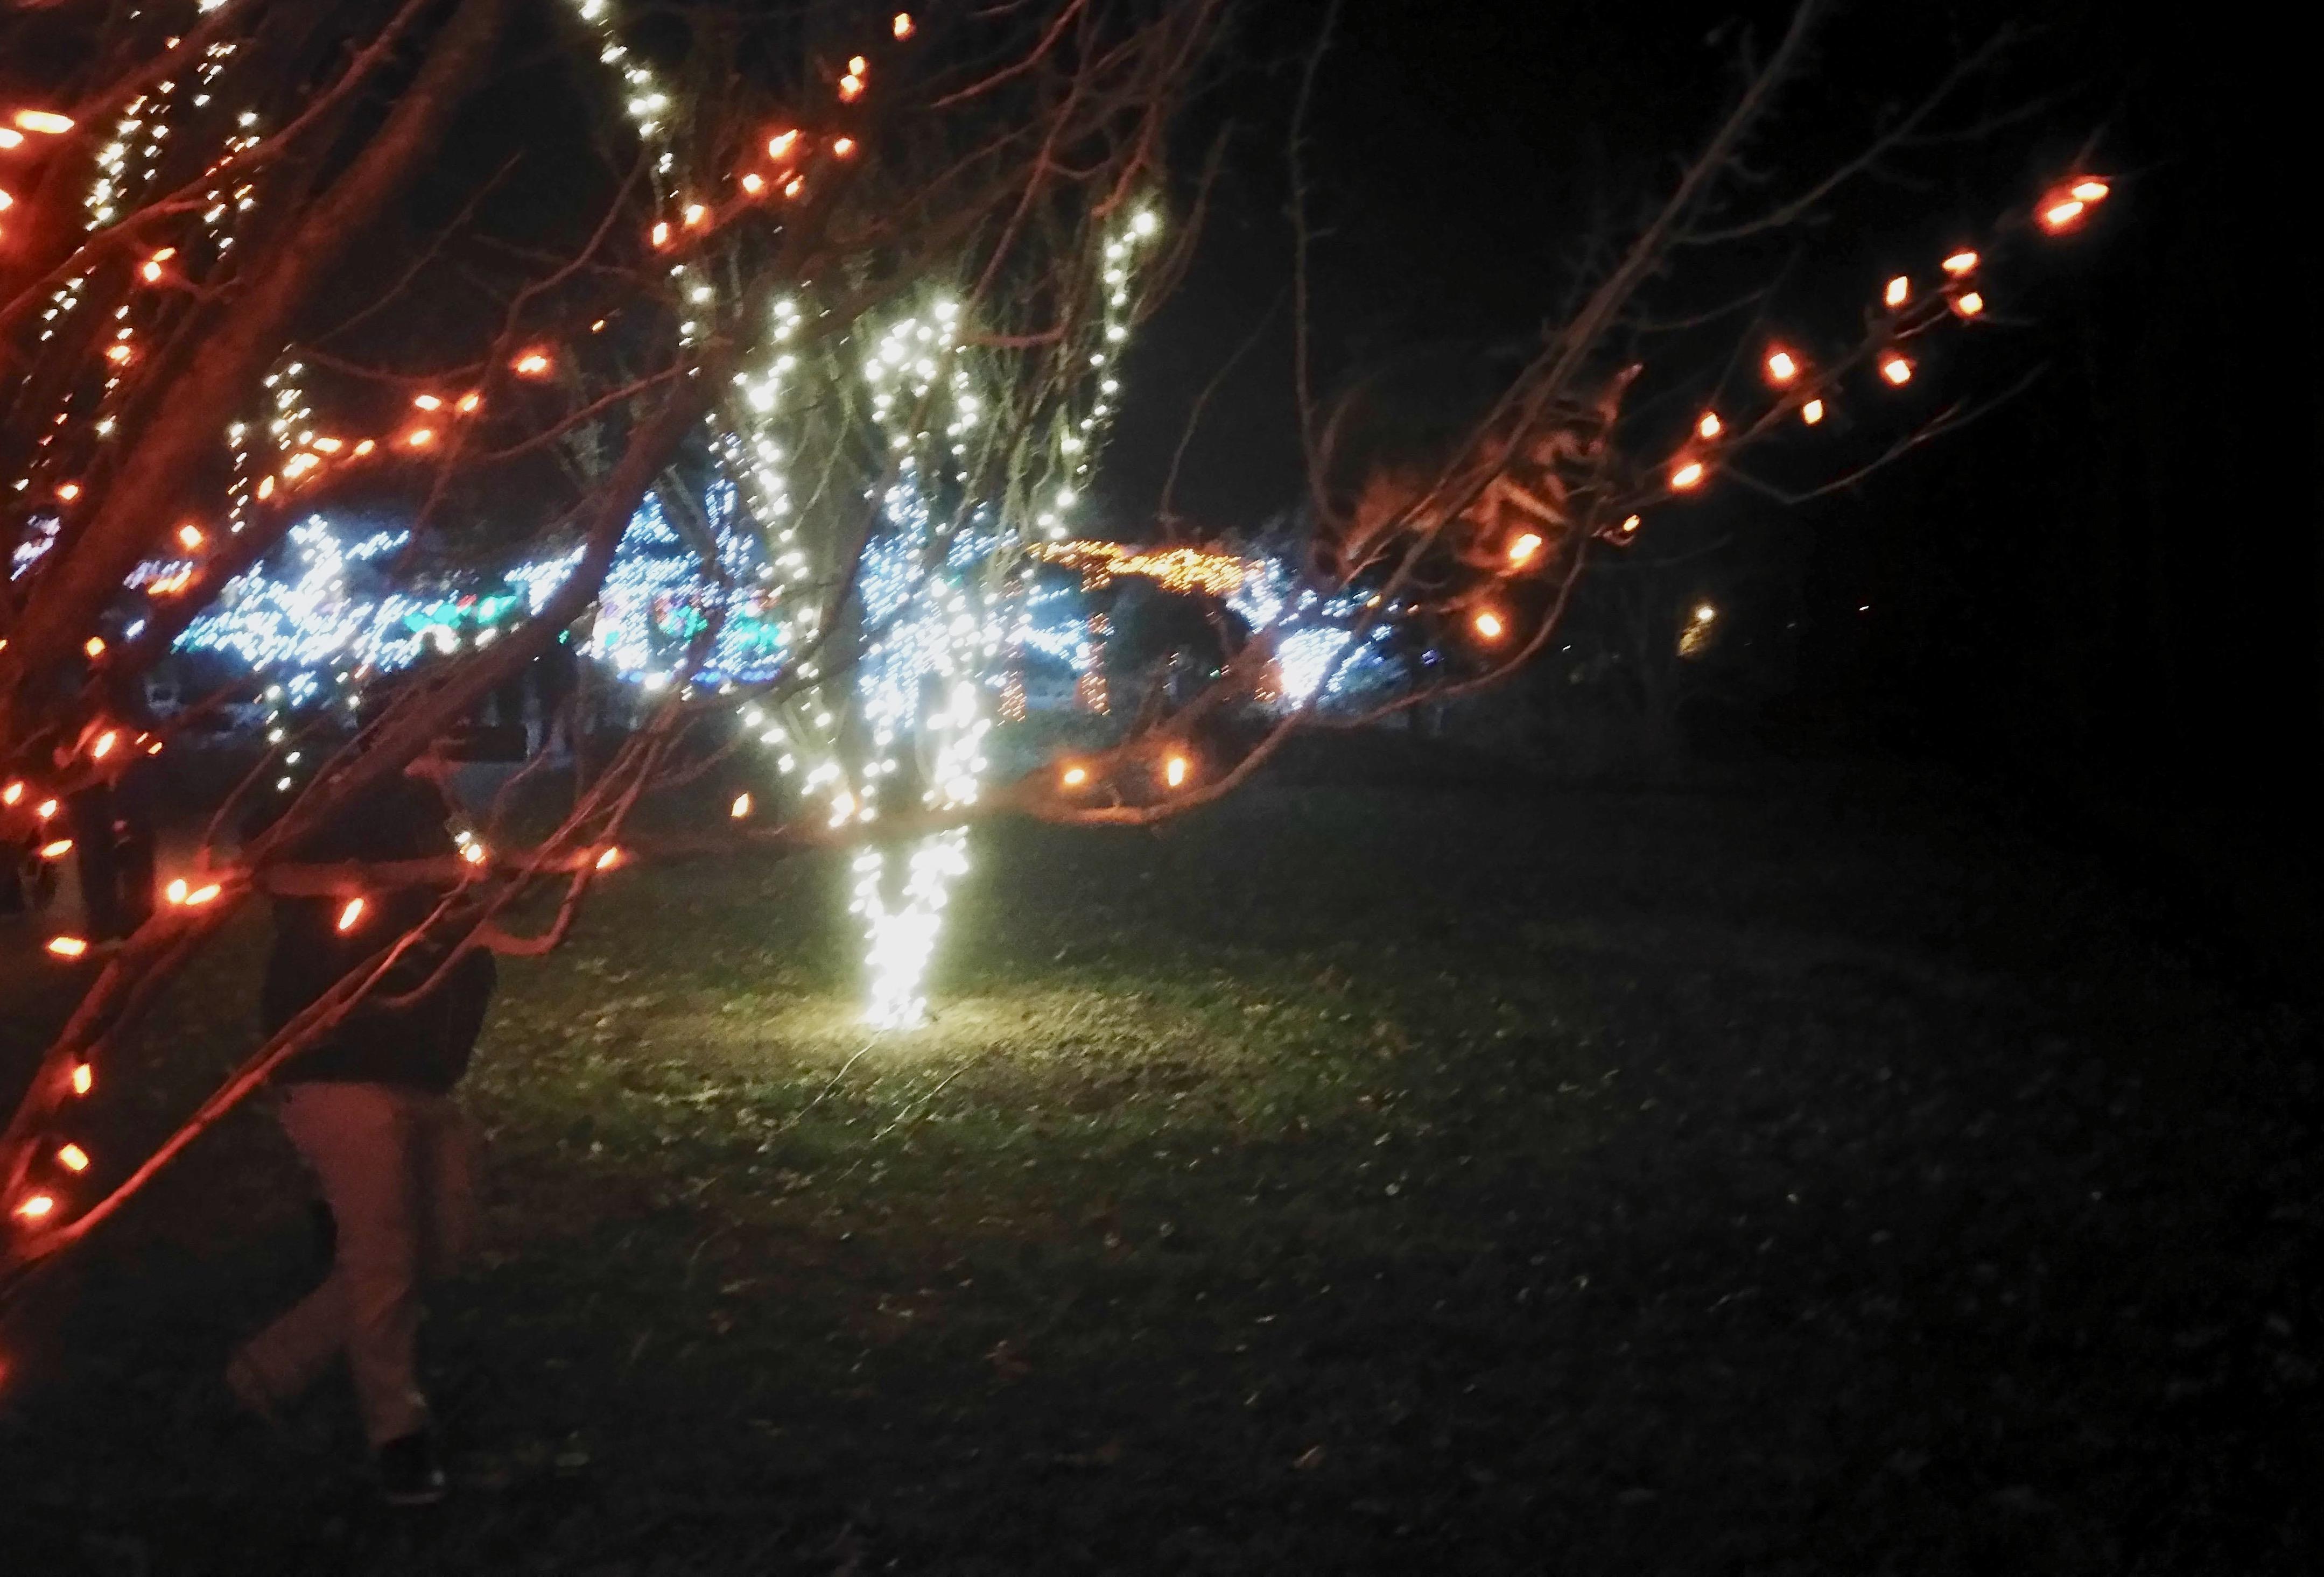 dc holiday light displays kidfriendly dc